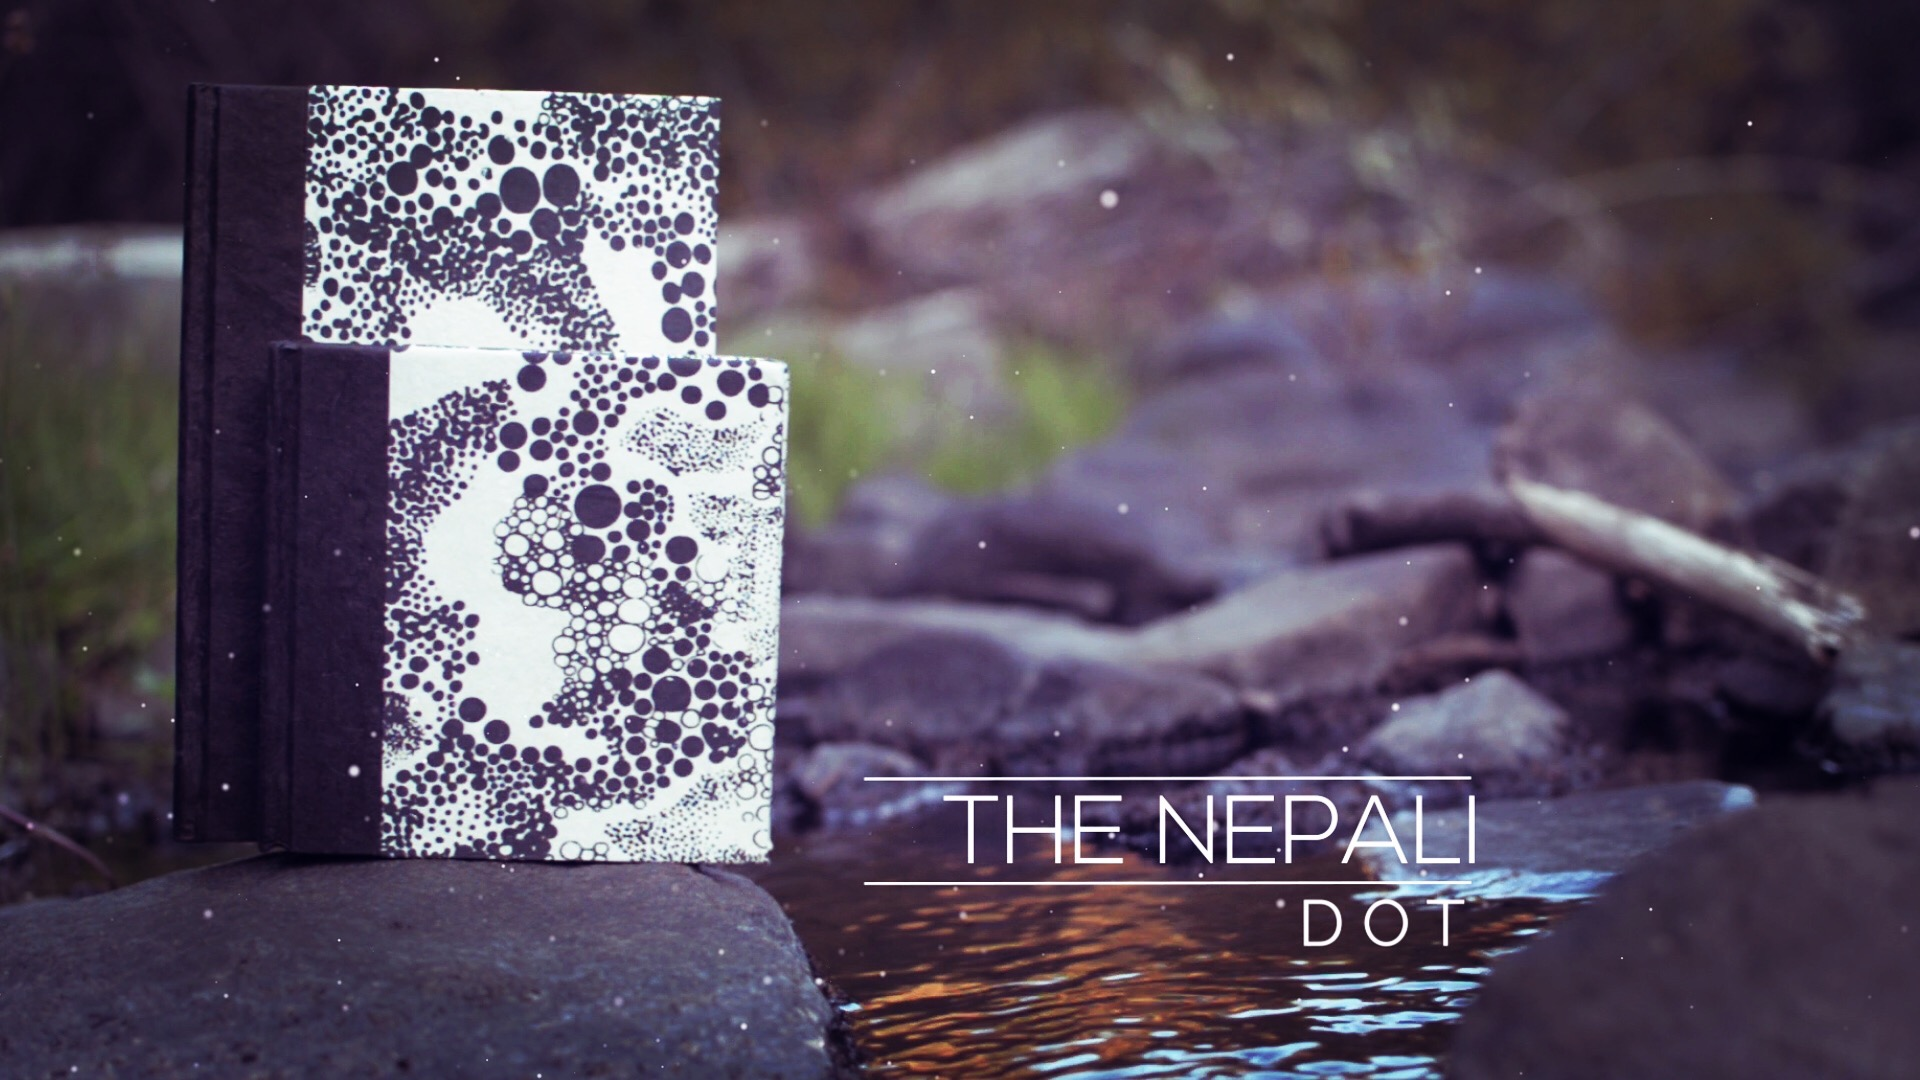 Introducing the Nepali Dot